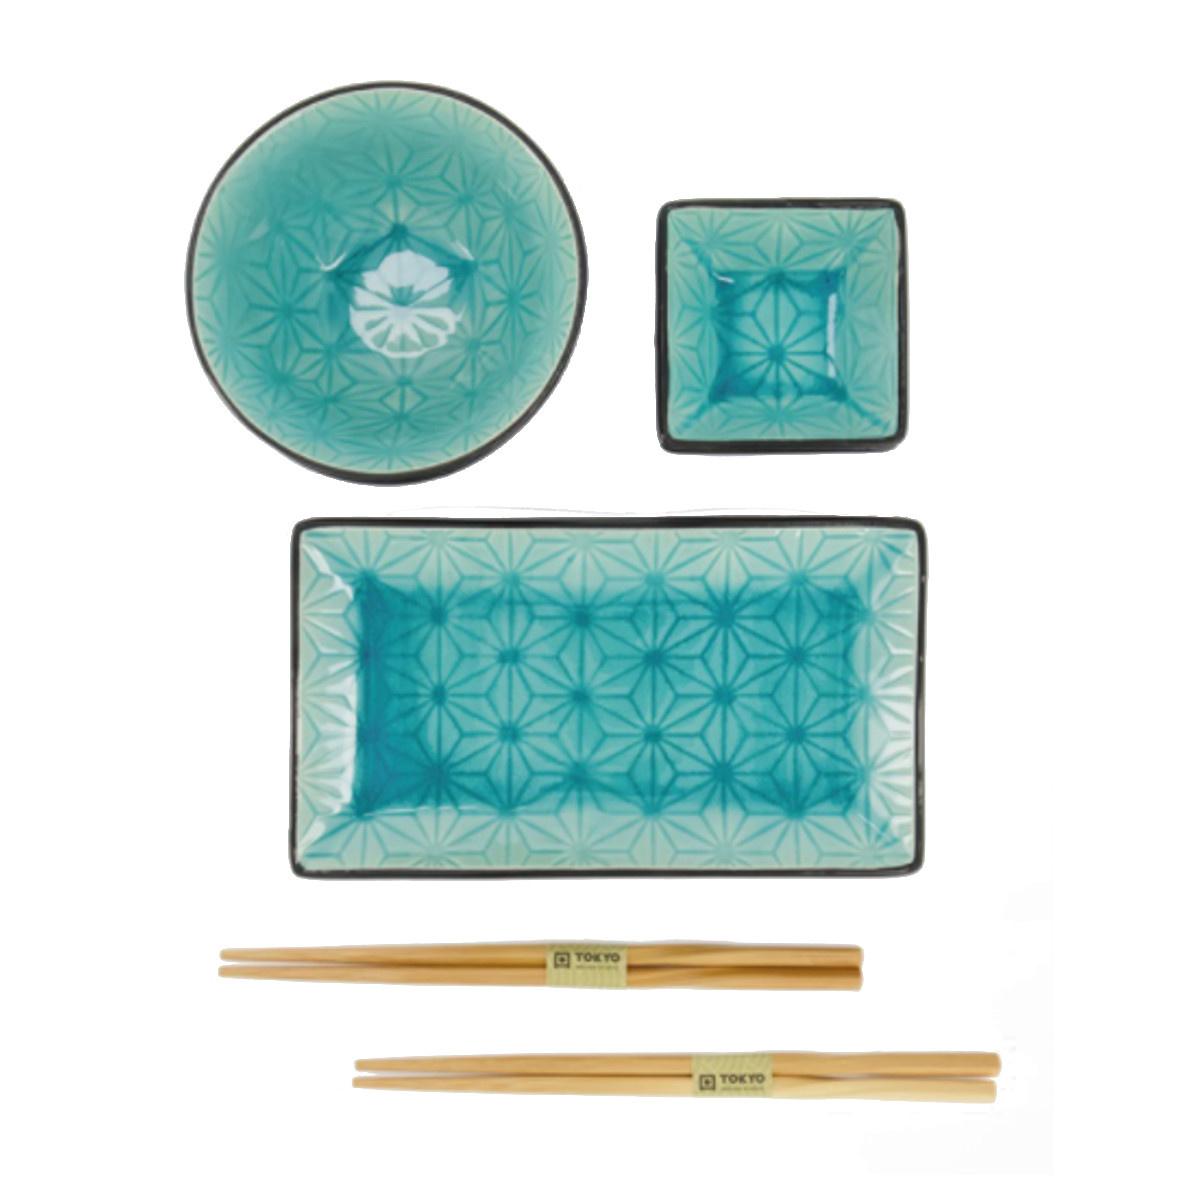 Tokyo Design Studio Tokyo Design Studio Glassy Turquoise Star Sushi Dinnerware Set – 8 pieces